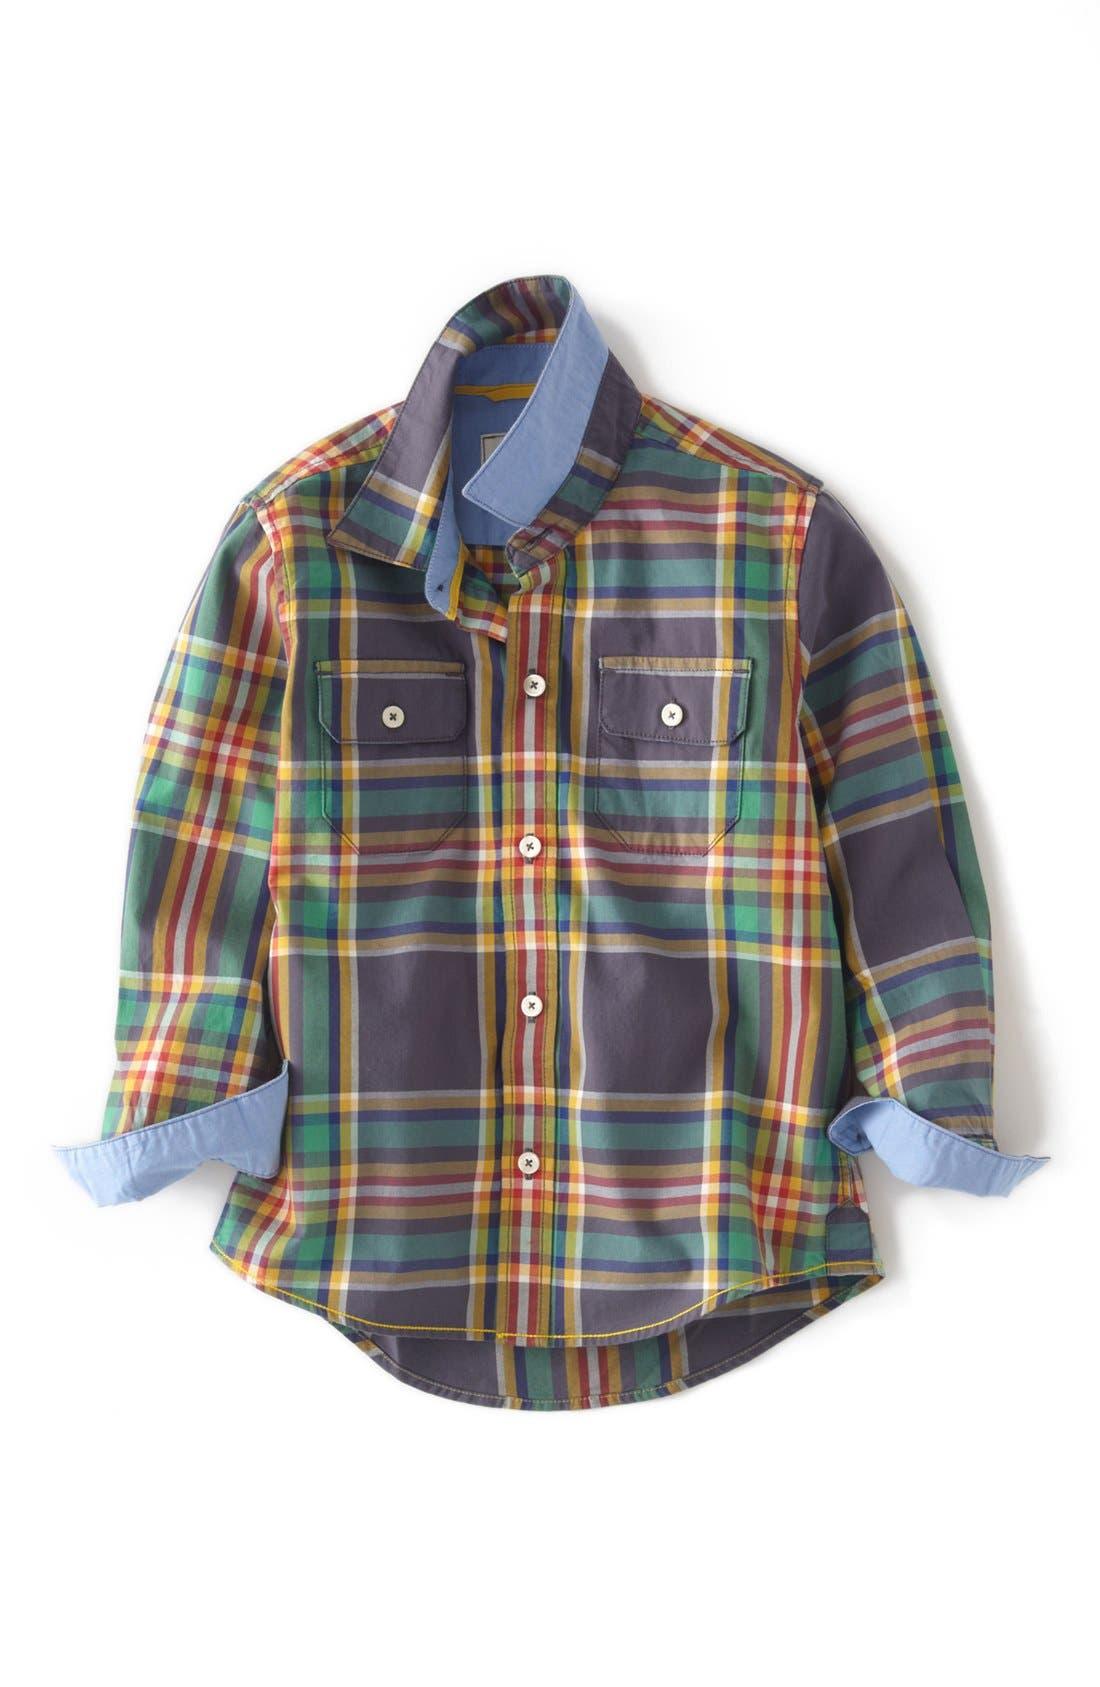 Alternate Image 1 Selected - Mini Boden Long Sleeve Sport Shirt (Toddler Boys, Little Boys & Big Boys)